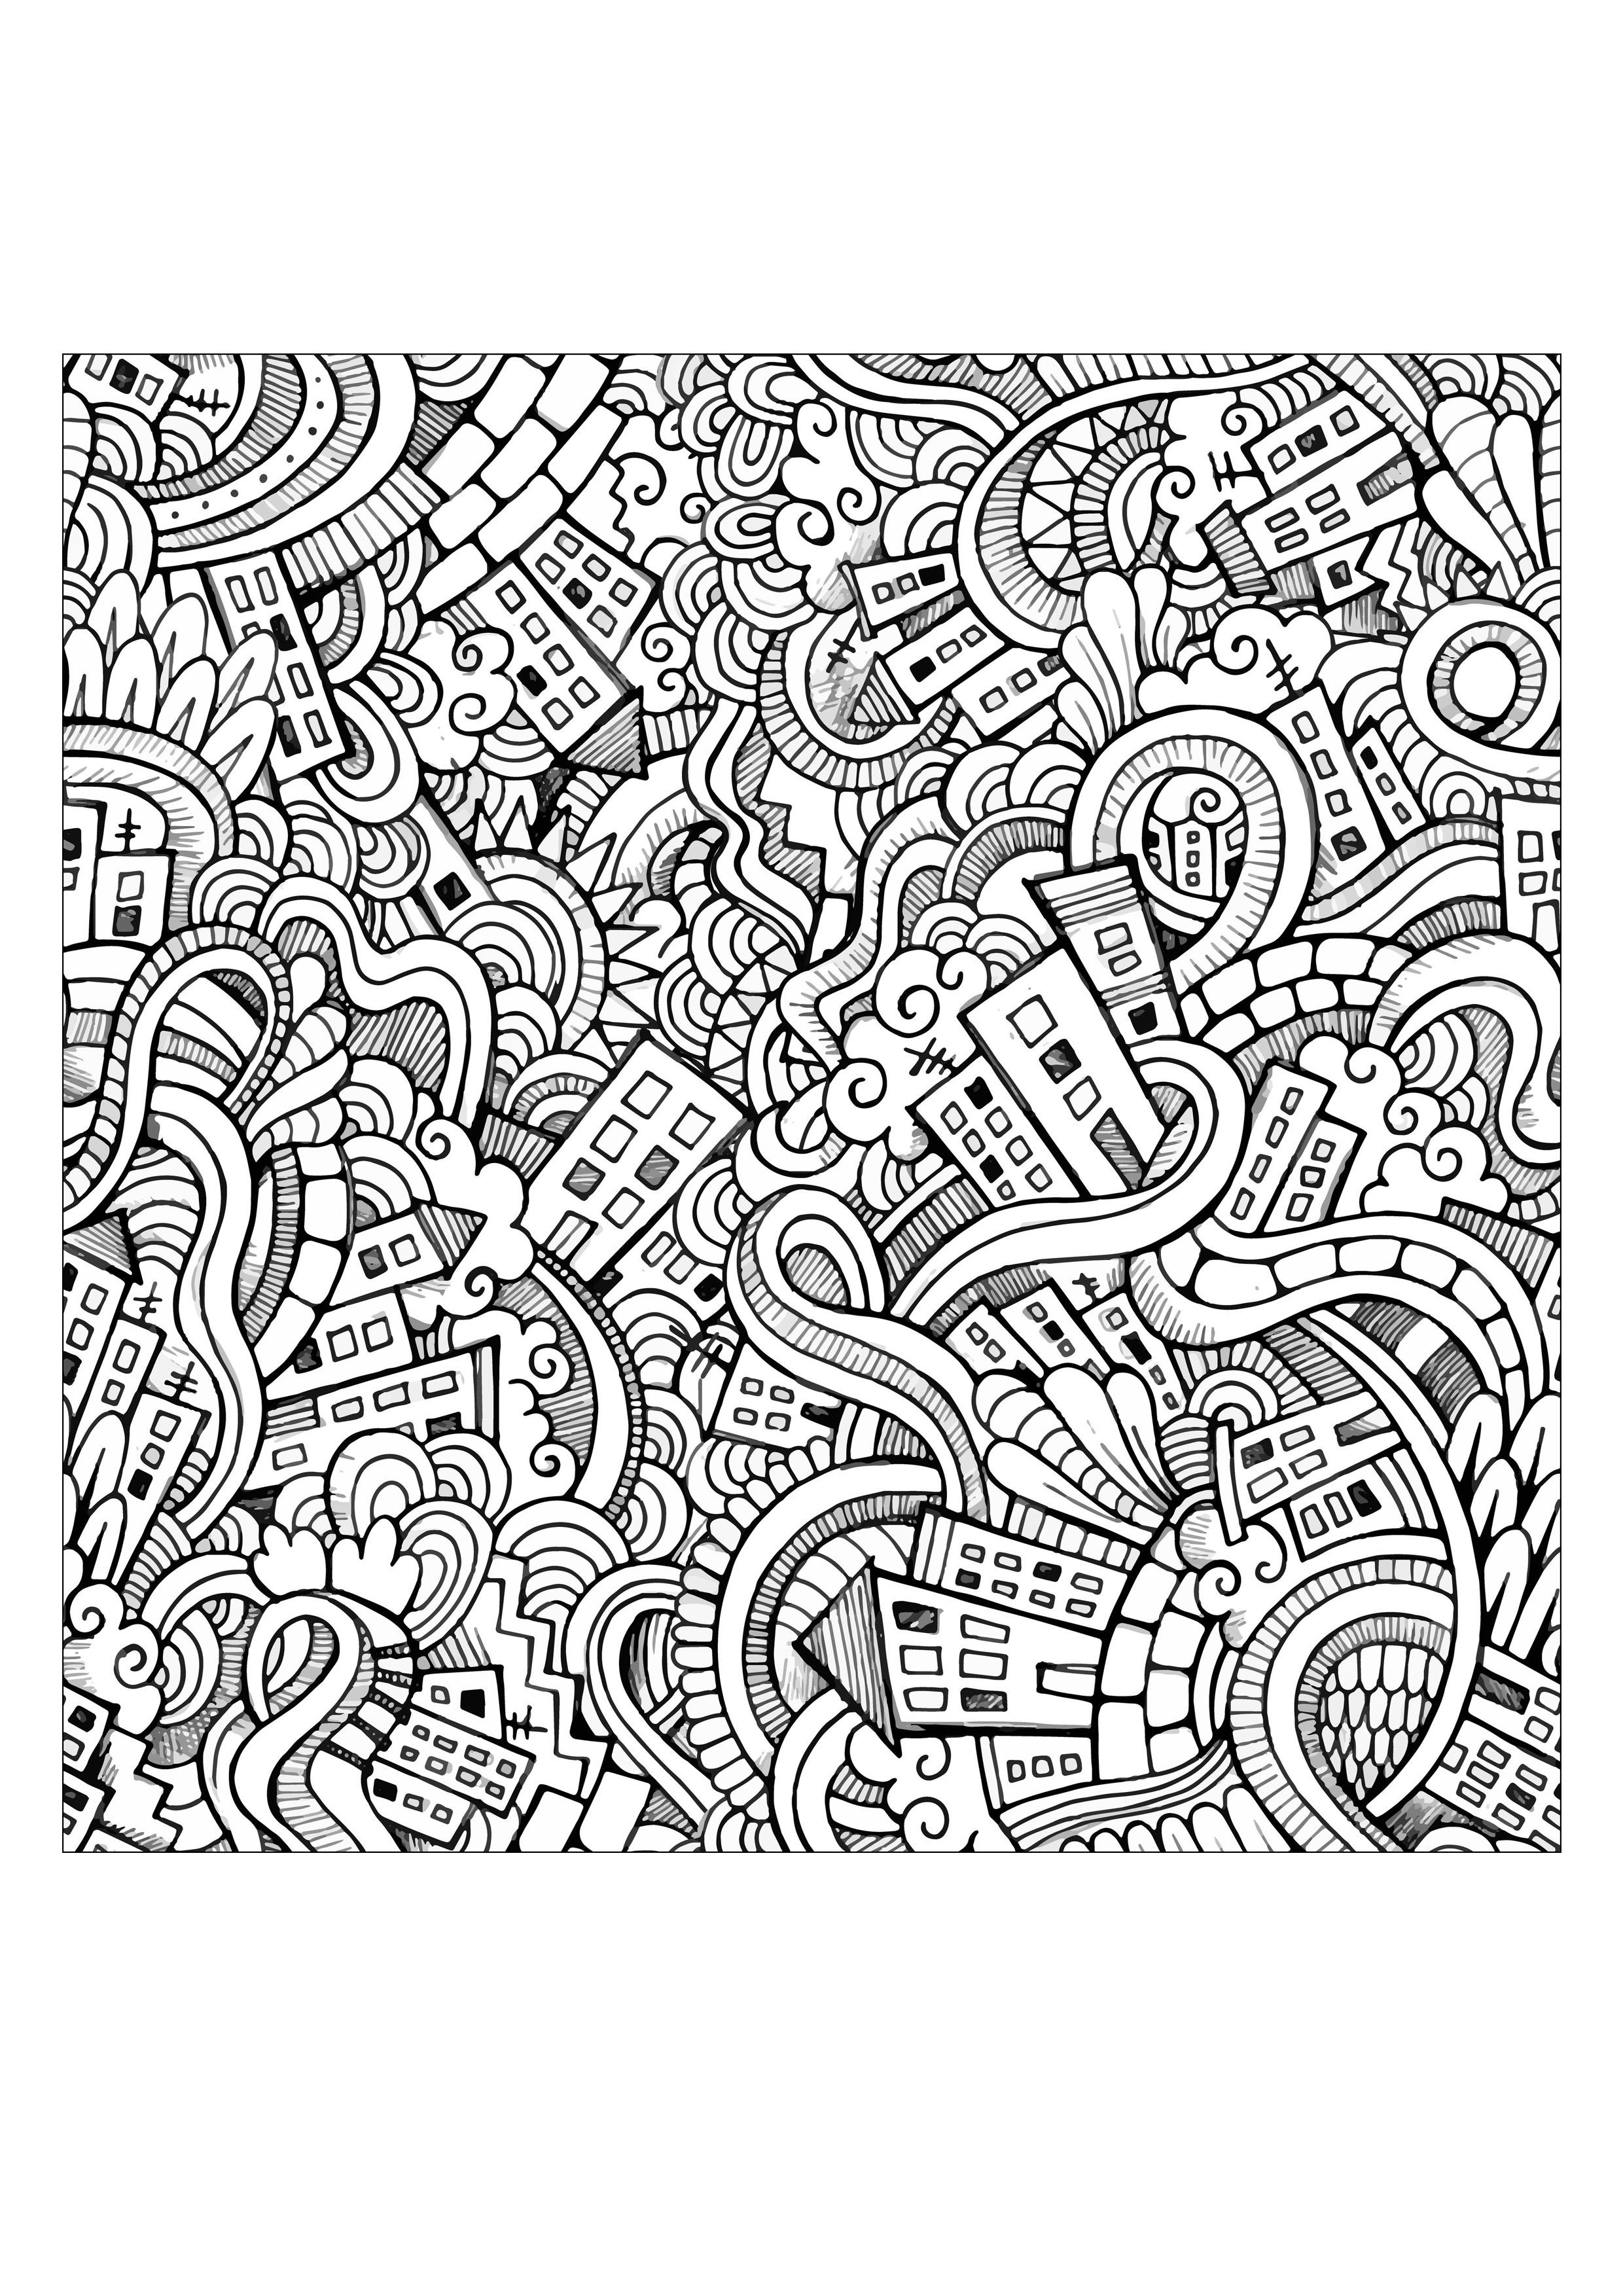 Doodle art to download - Doodle Art Kids Coloring Pages